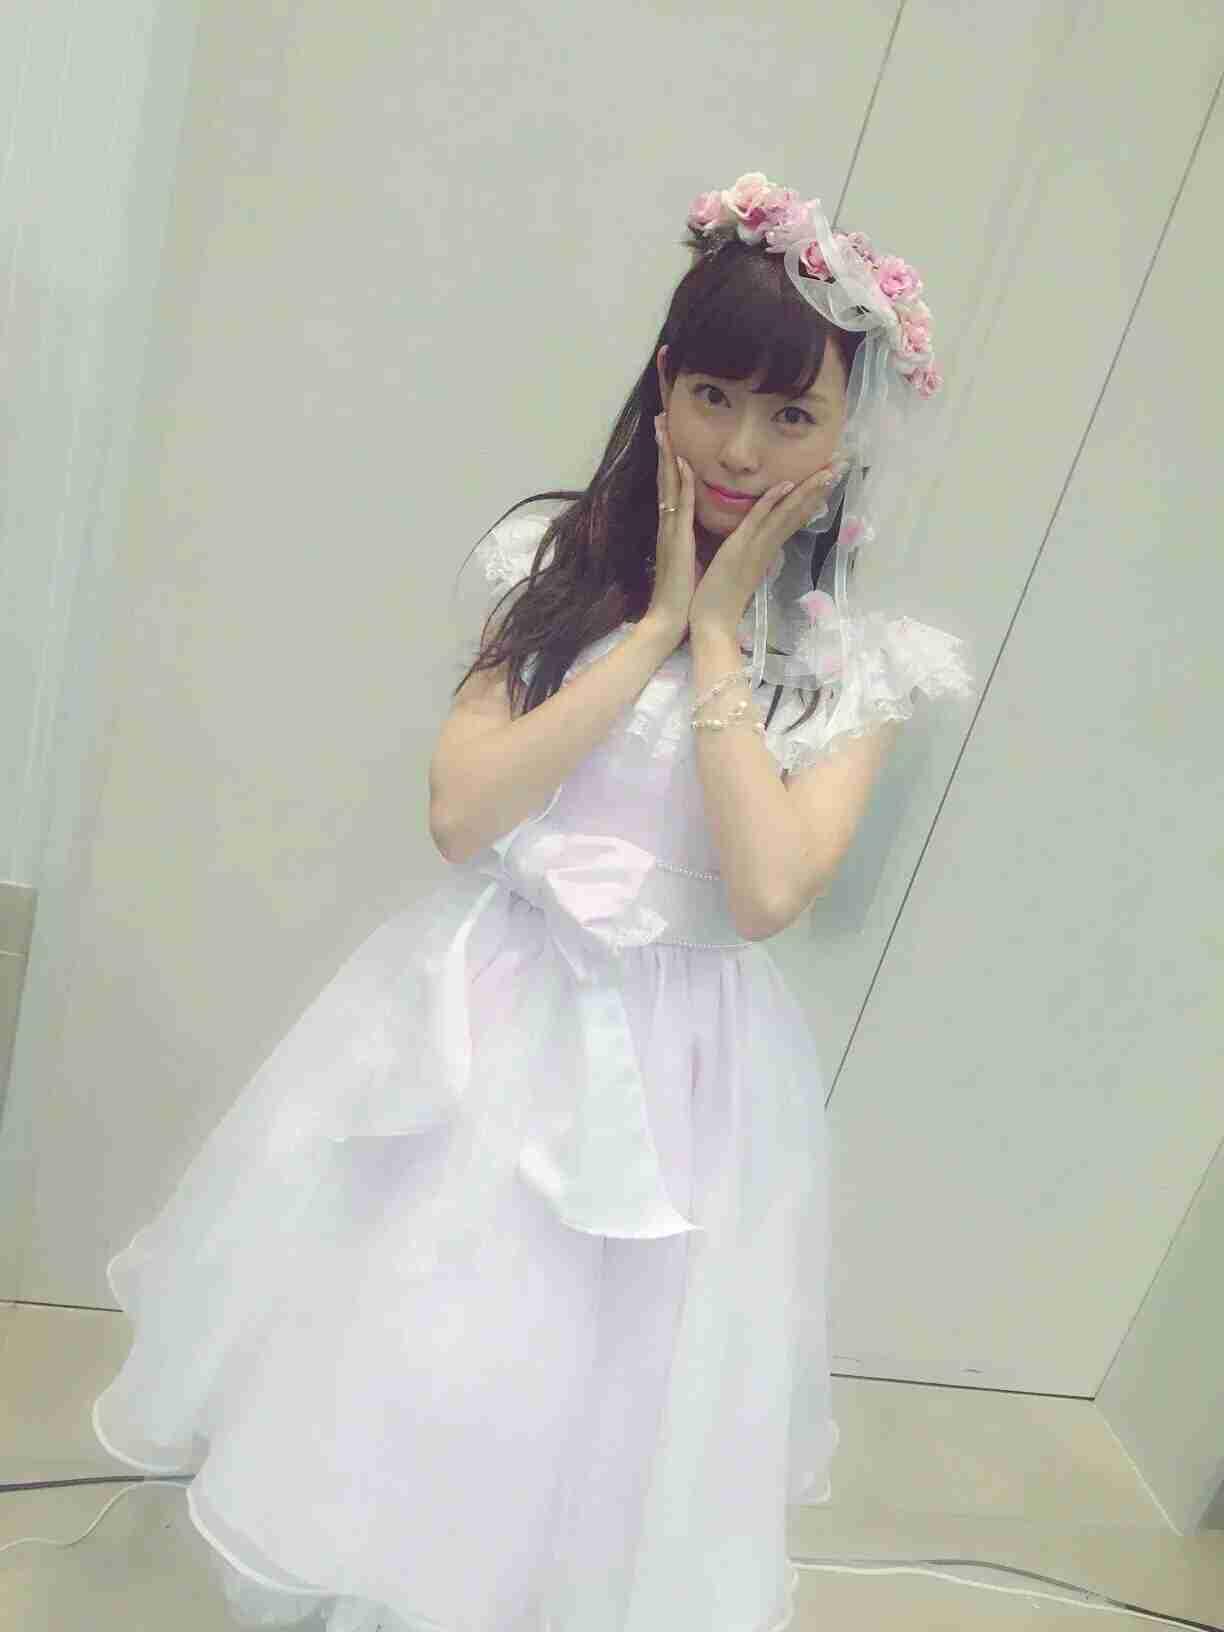 NMB48渡辺美優紀、卒業公演は8・9に決定「本当に最後。来てください」